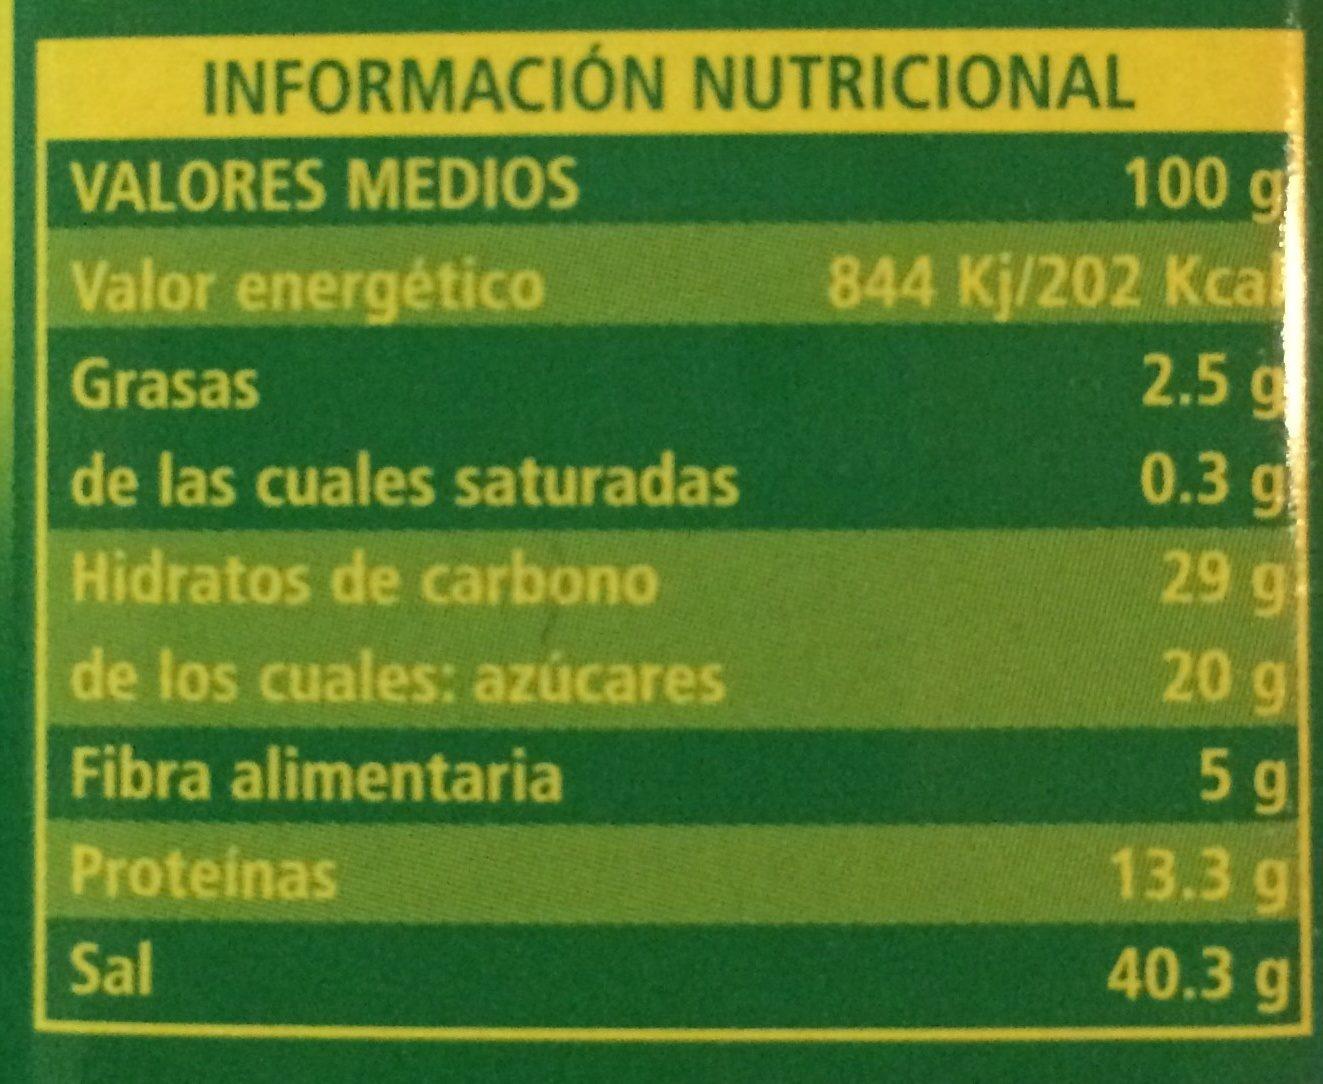 Avecrem - Informació nutricional